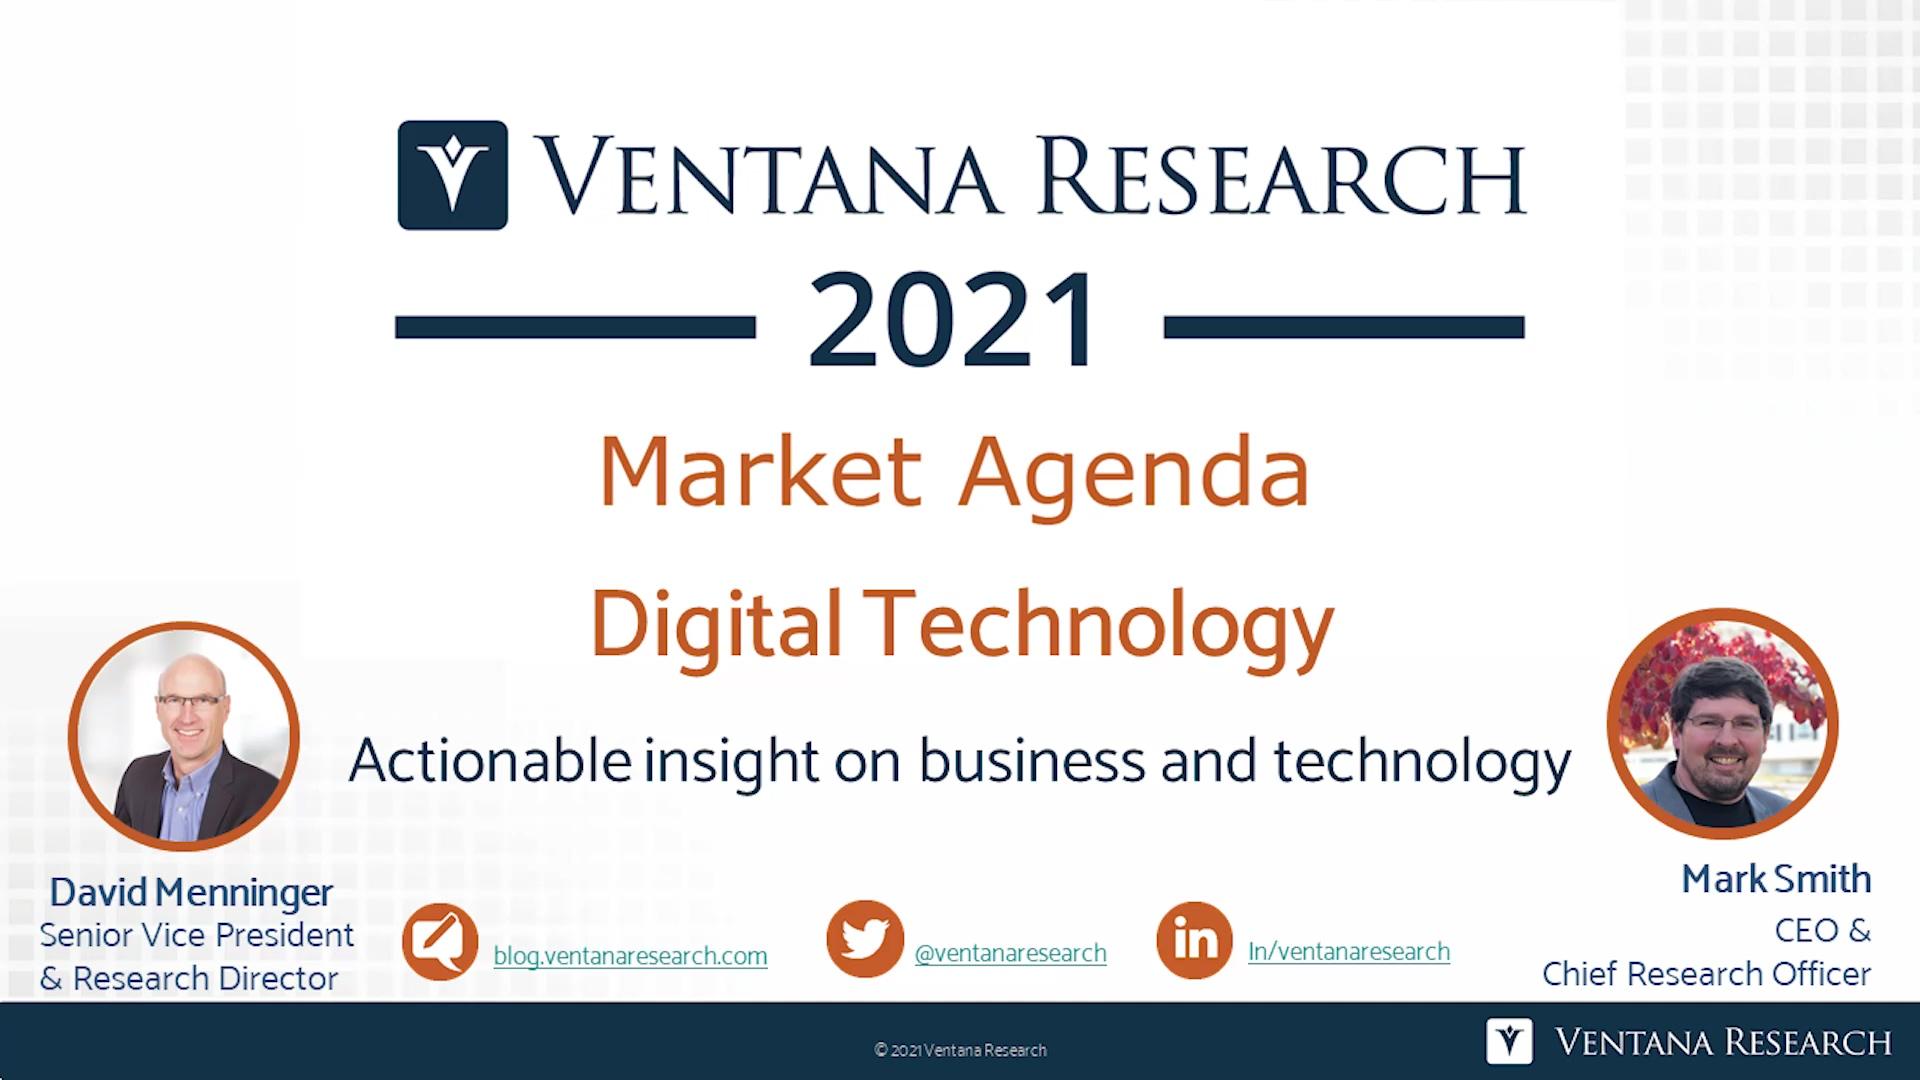 Ventana Research 2021 Market Agenda for Digital Technology